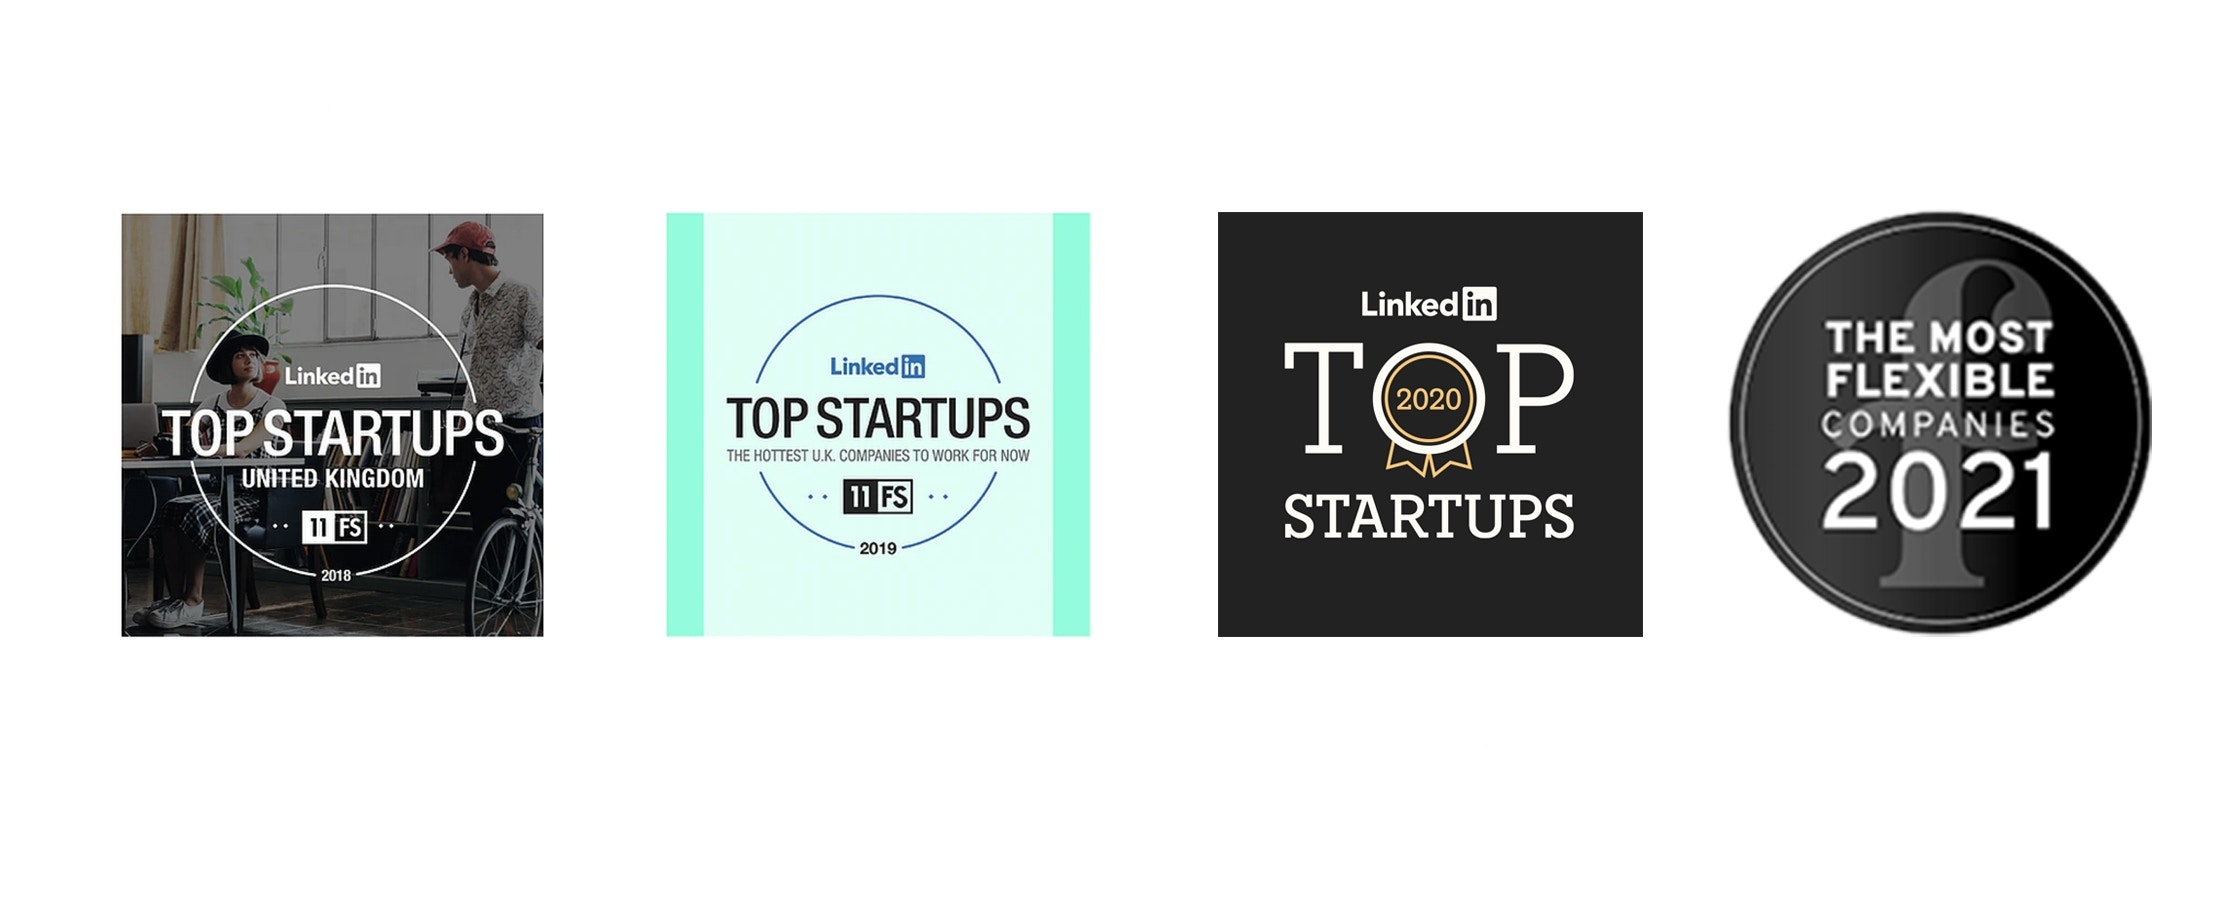 LinkedIn Top Startup Award